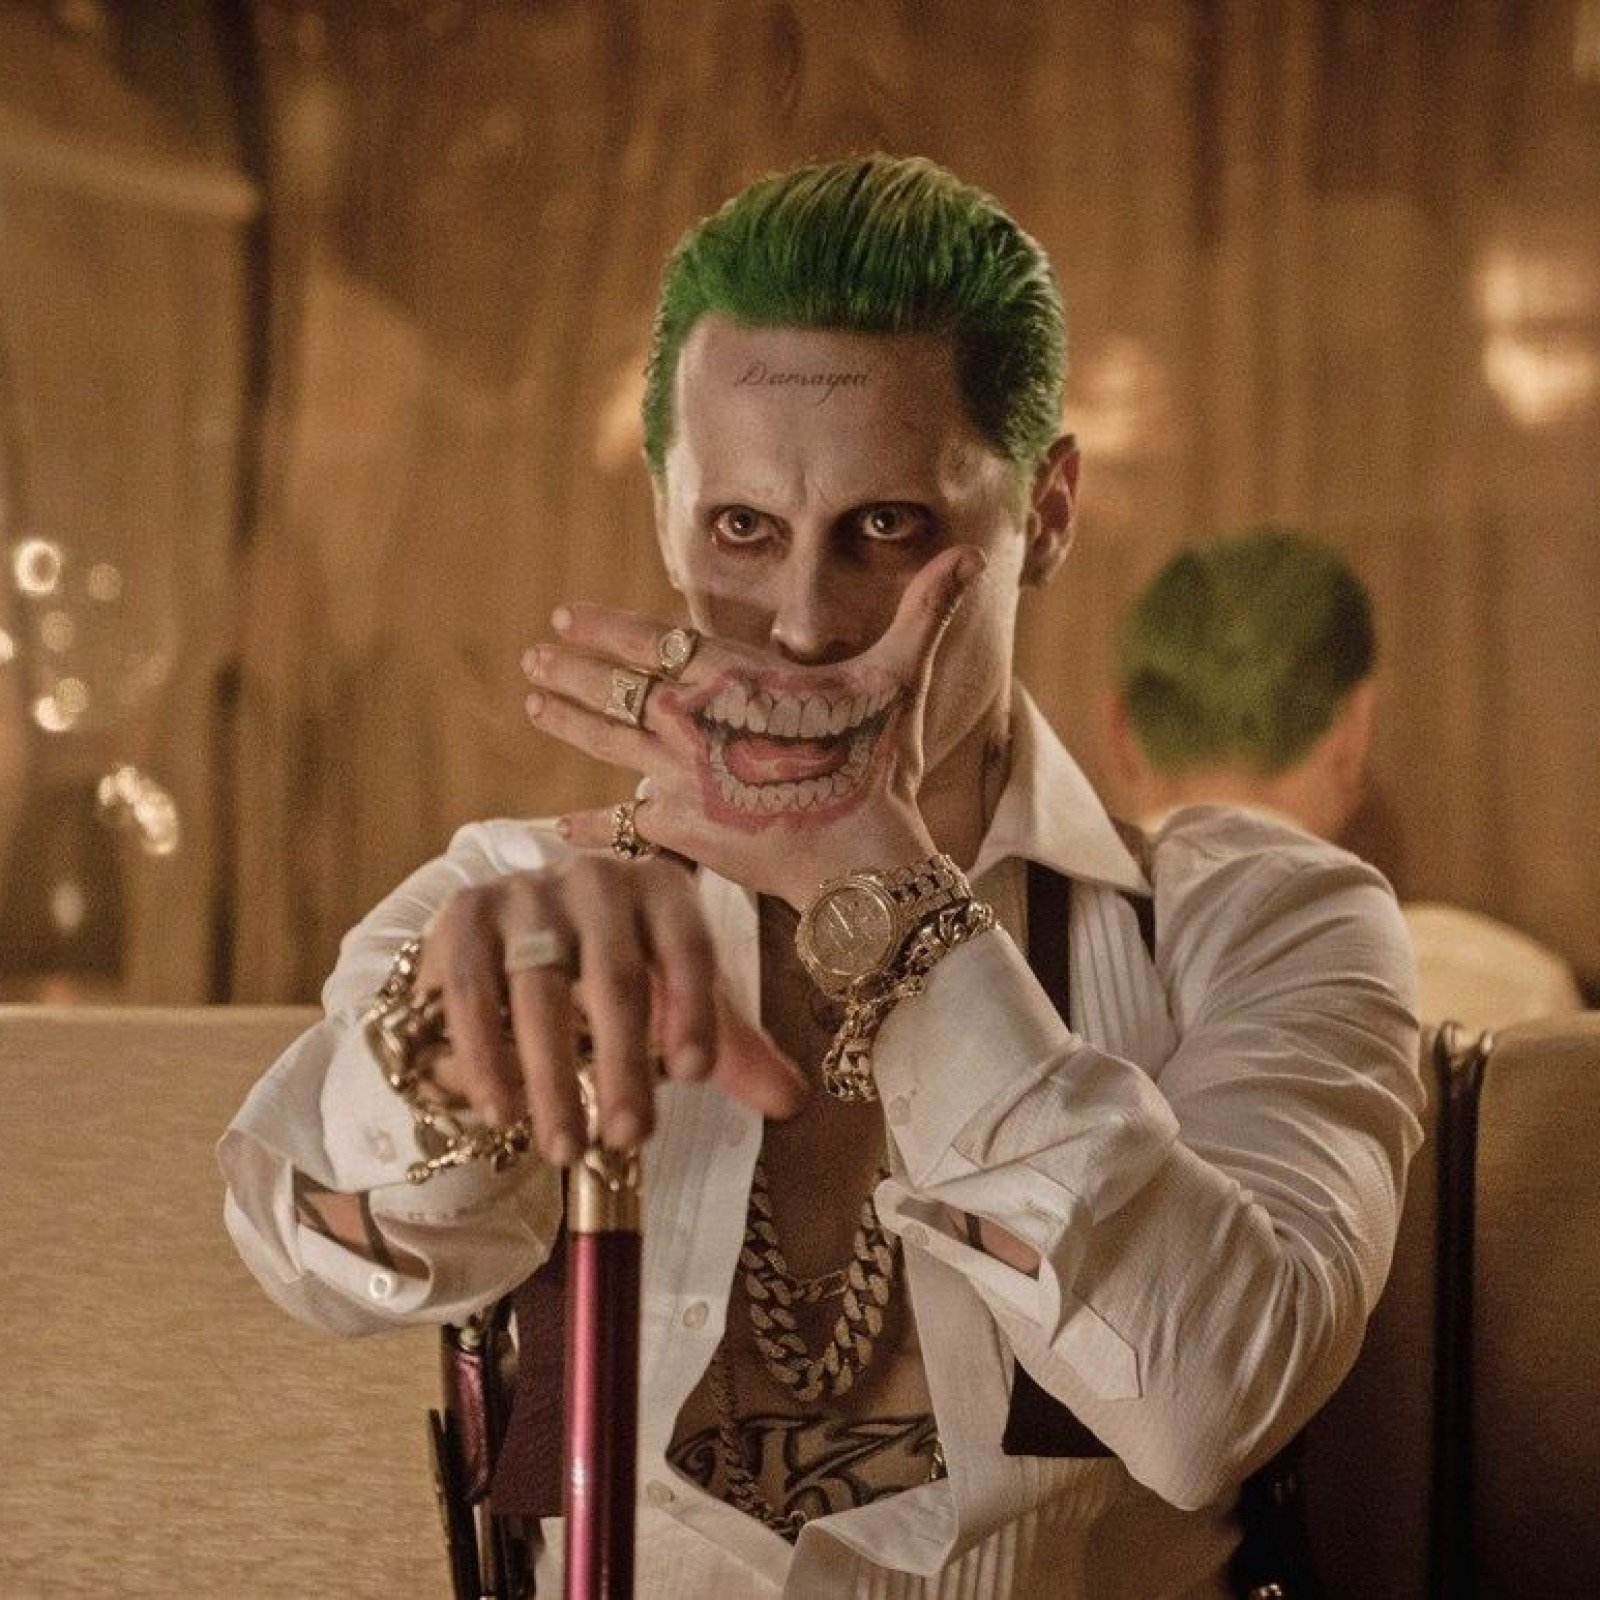 jared leto joker The 20 Biggest Ways Joker Breaks the Superhero Mold